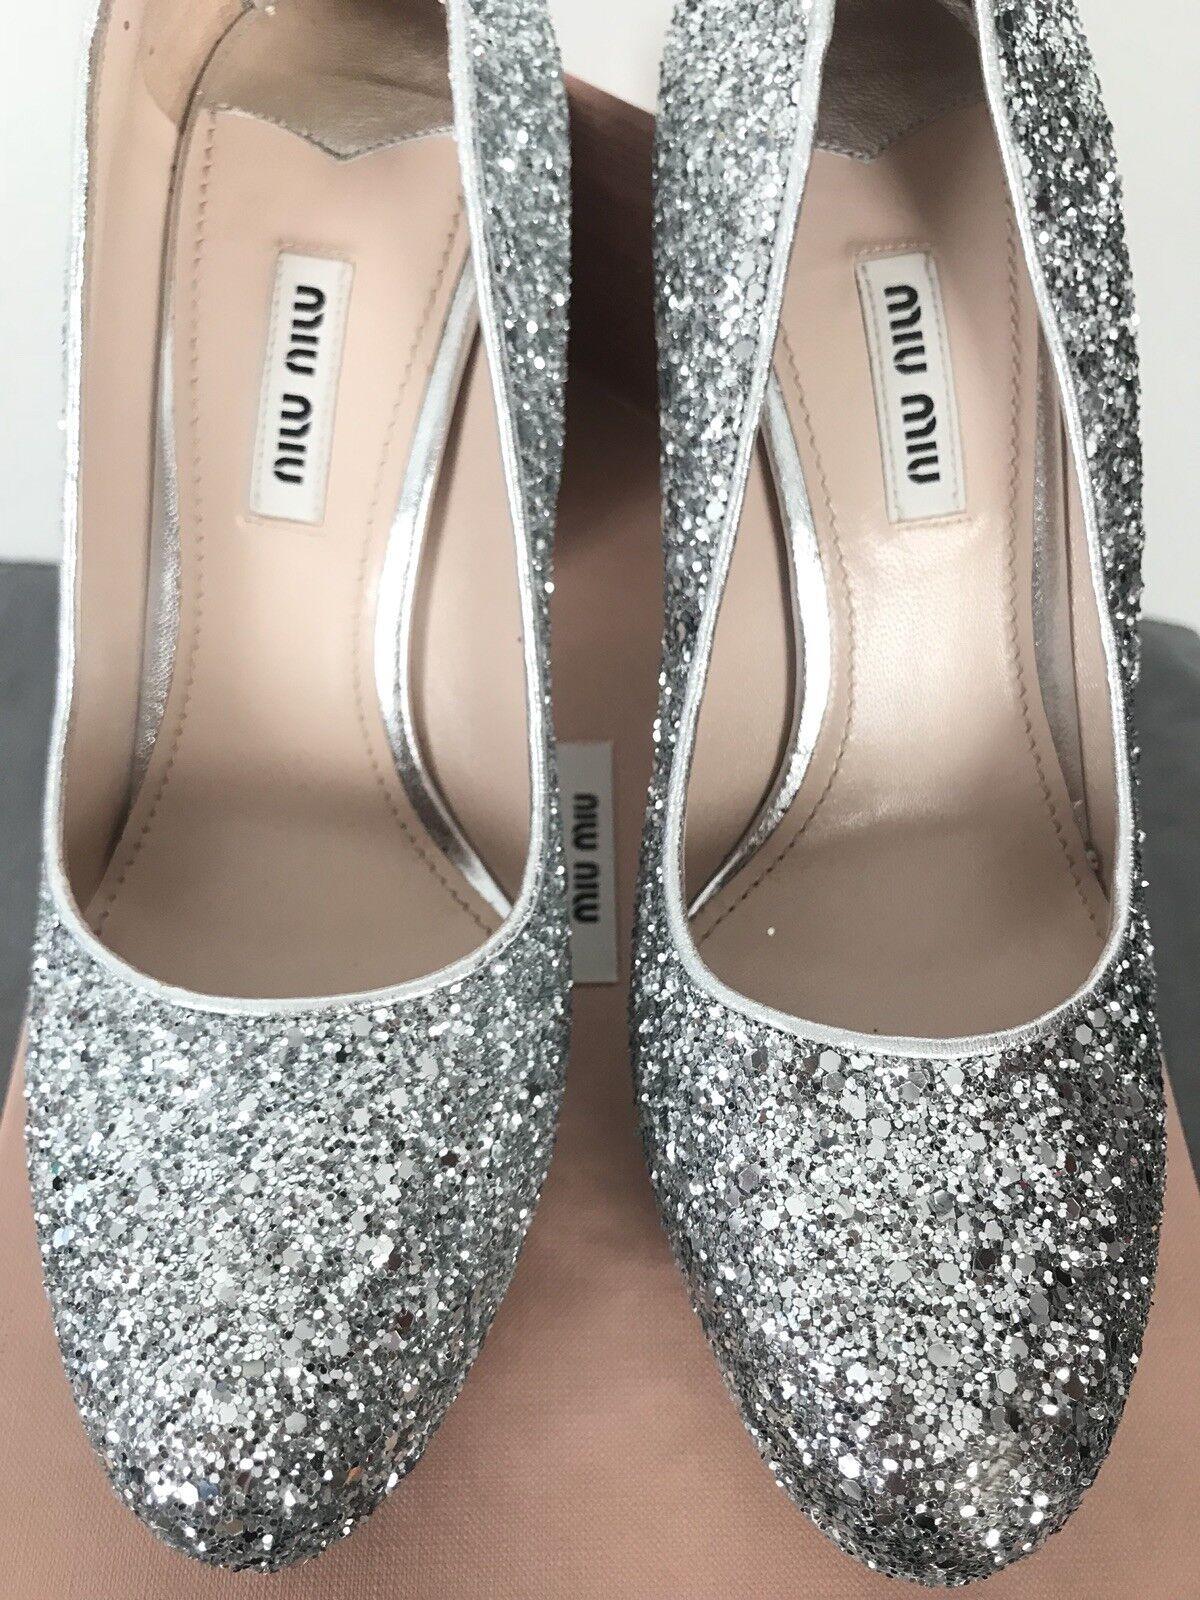 890 MIU MIU MIU MIU Glitter Silver Pumps Calzature women Metallic Heels 38 7.5 Box Bags 019806